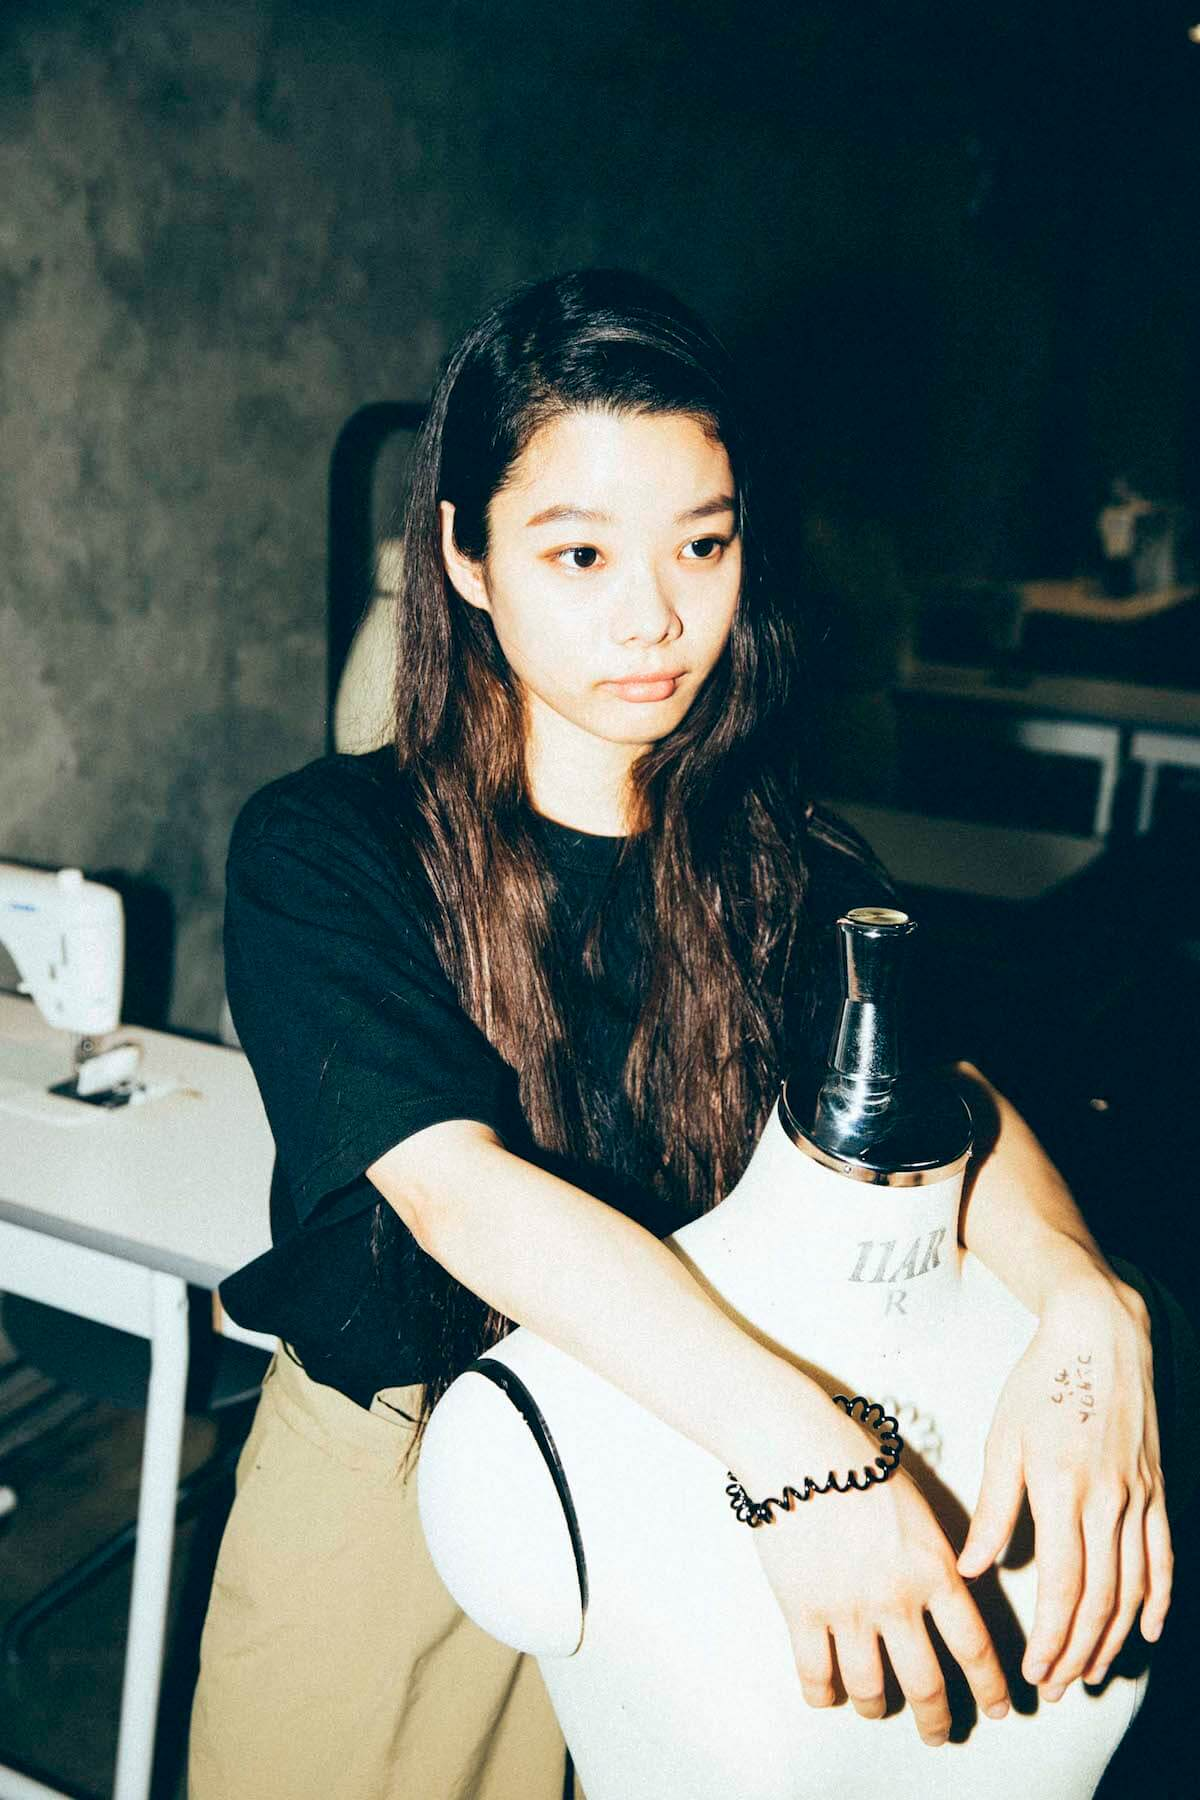 xiangyu × 半澤(PERMINUTE)× 神谷(テニスコート)対談|予測できない化学反応<香魚荘827>とは? interview190807_xiangyu_4538.jpg